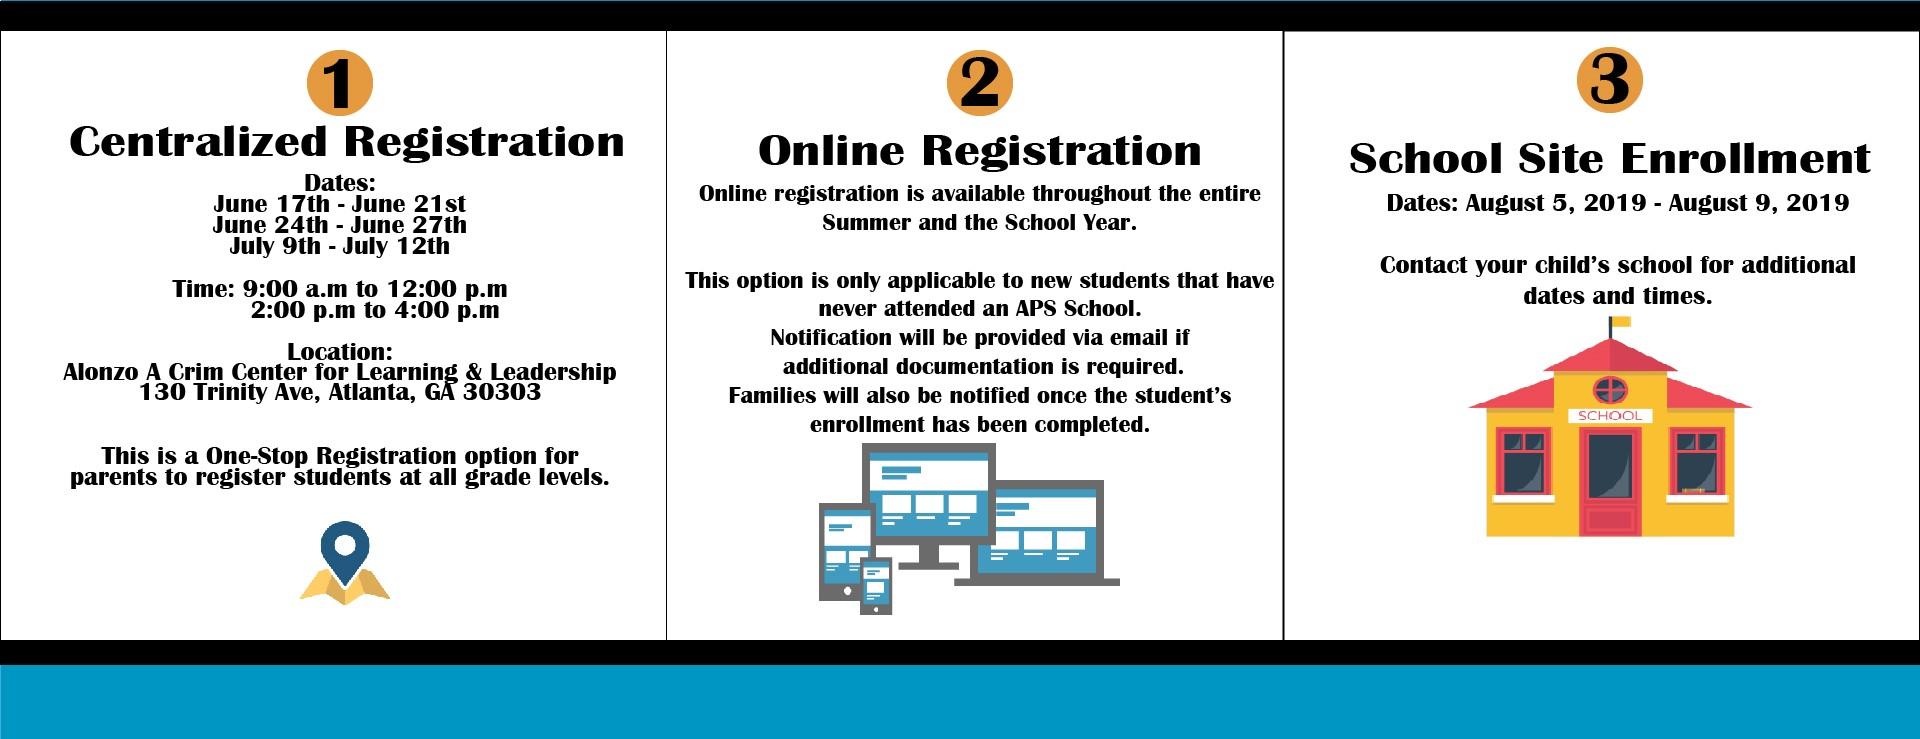 Enrollment & Registration / Summer Registration Options